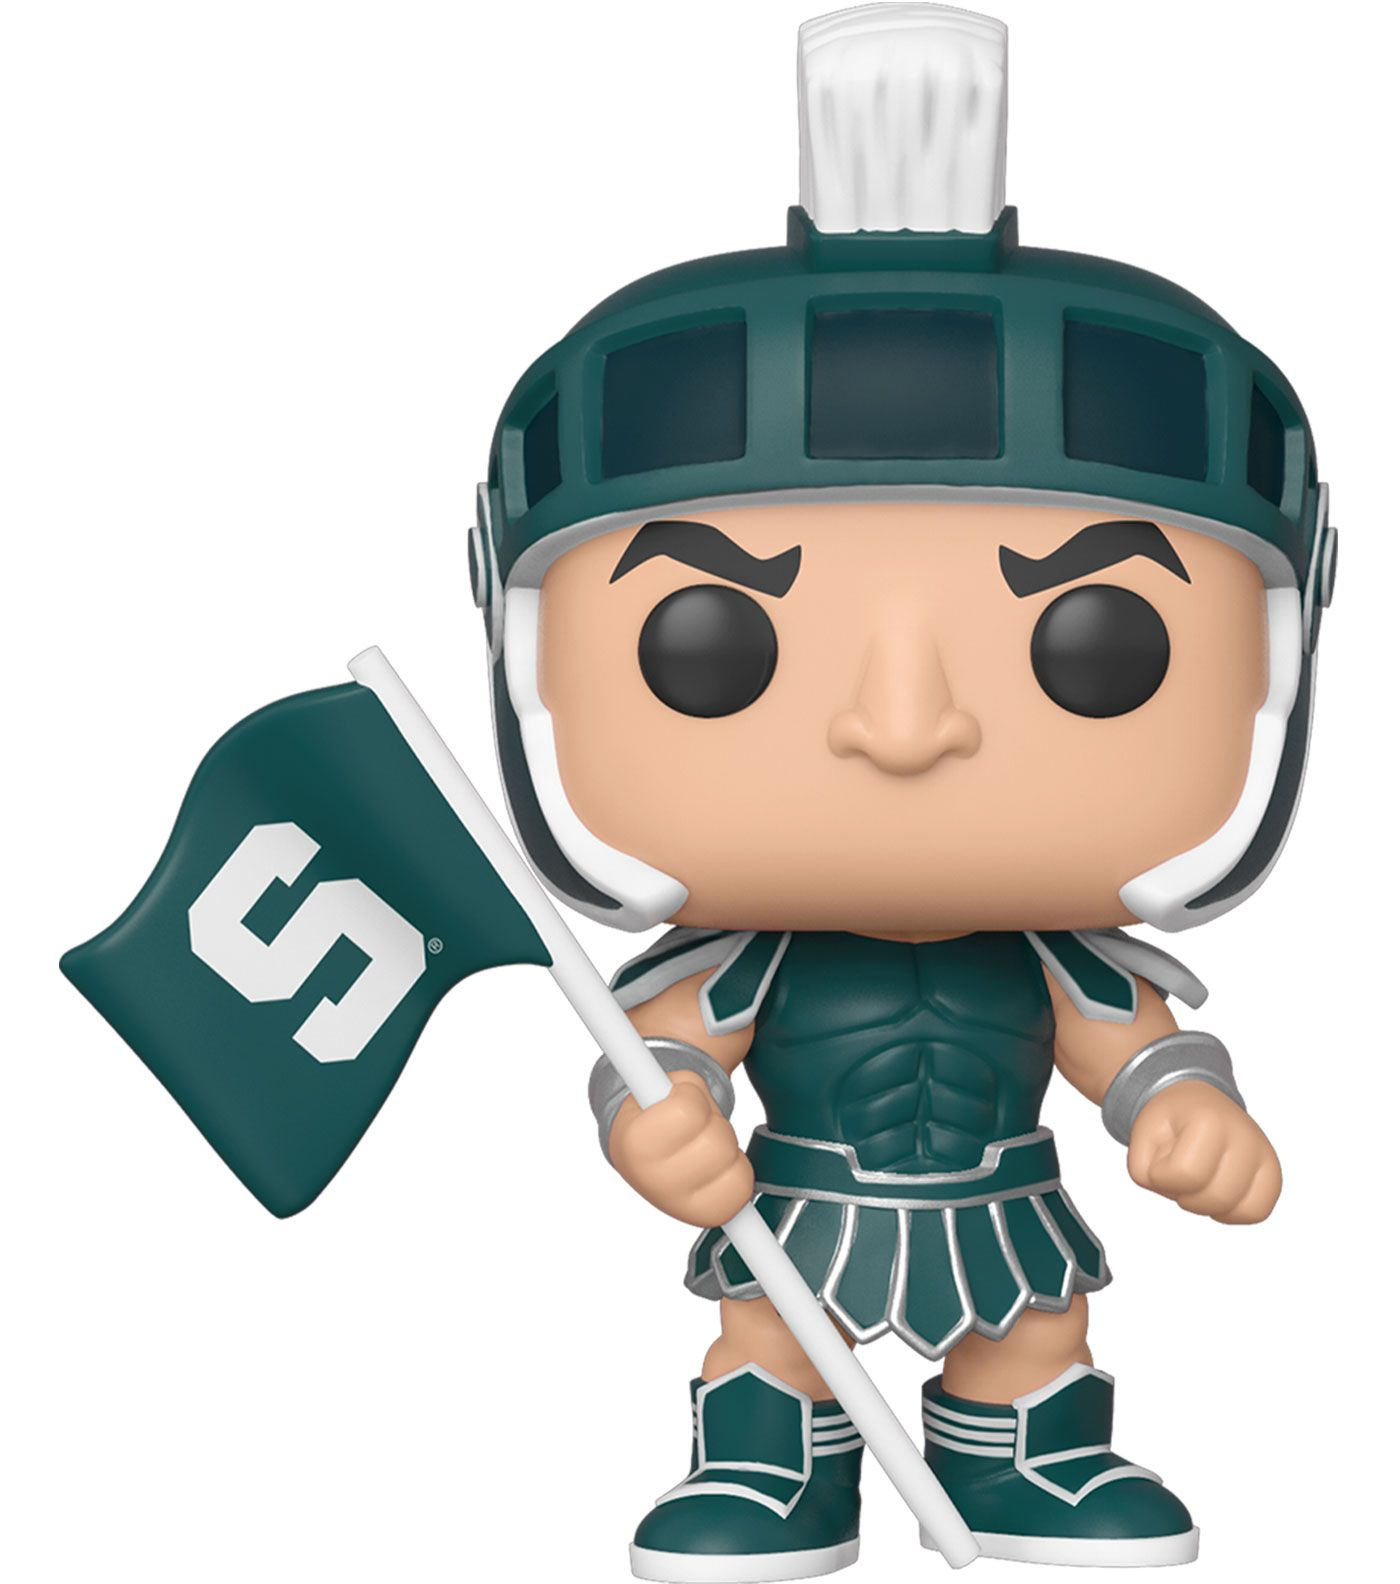 Funko POP! Michigan State Spartans Mascot Figure